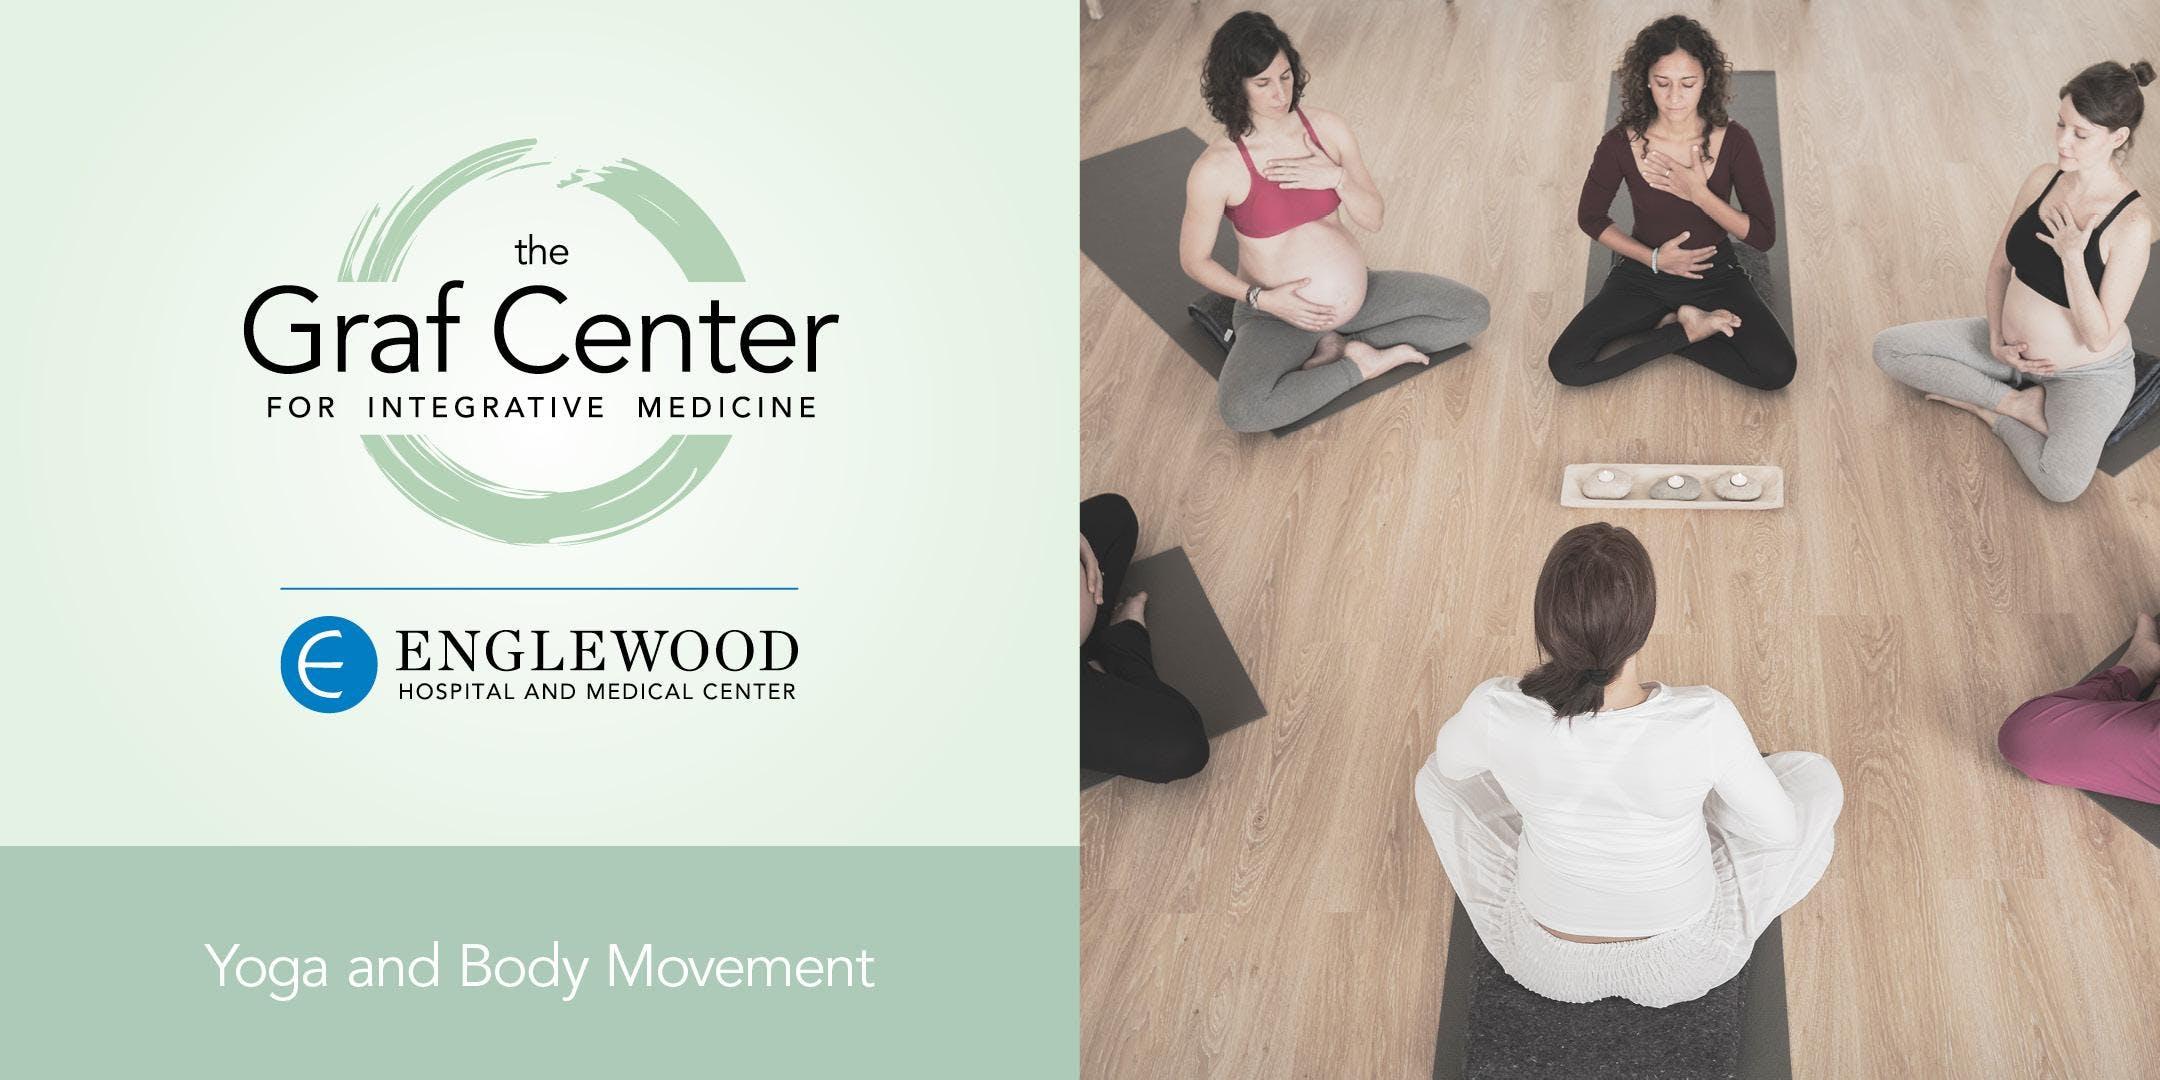 More info: Prenatal Yoga and Meditation